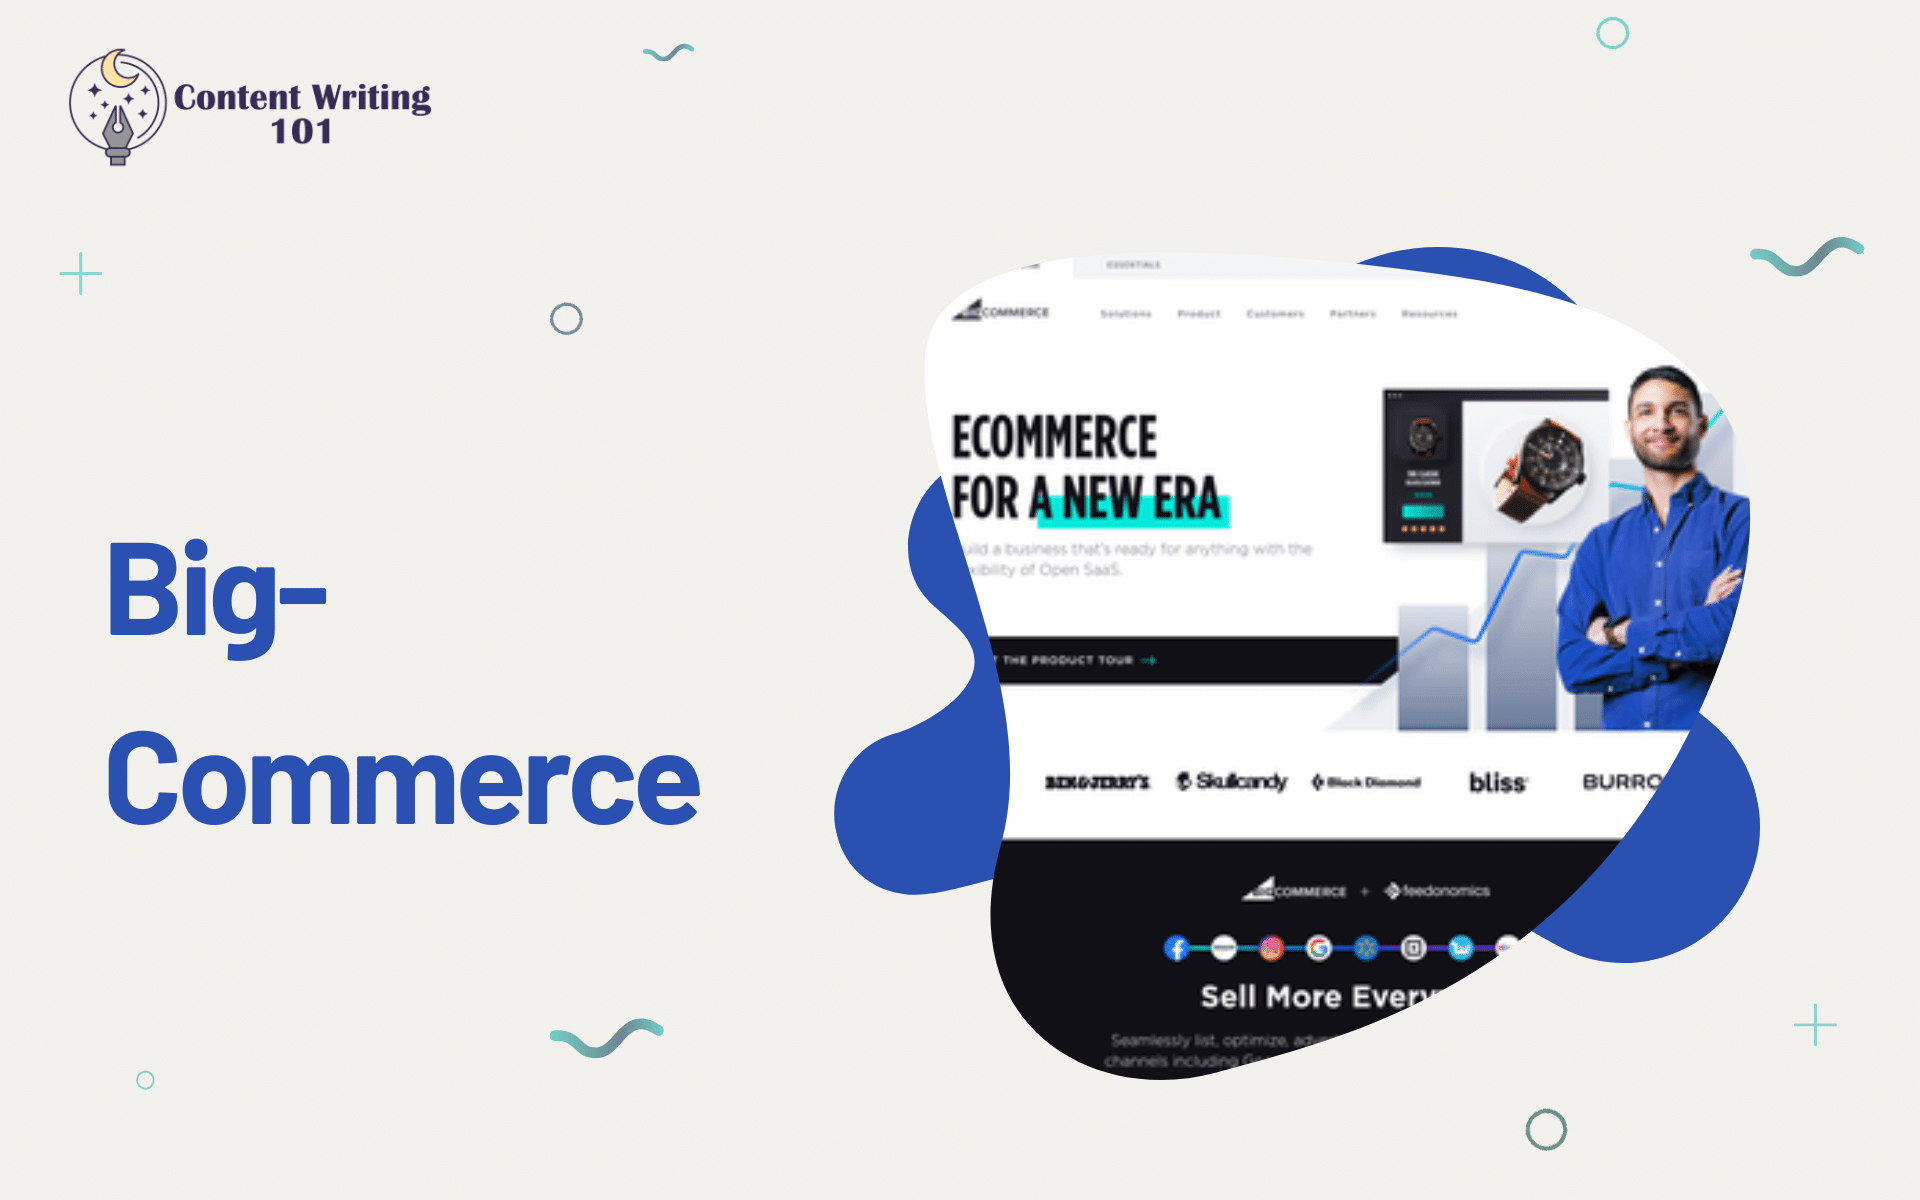 BigCommerce Content Writing 101